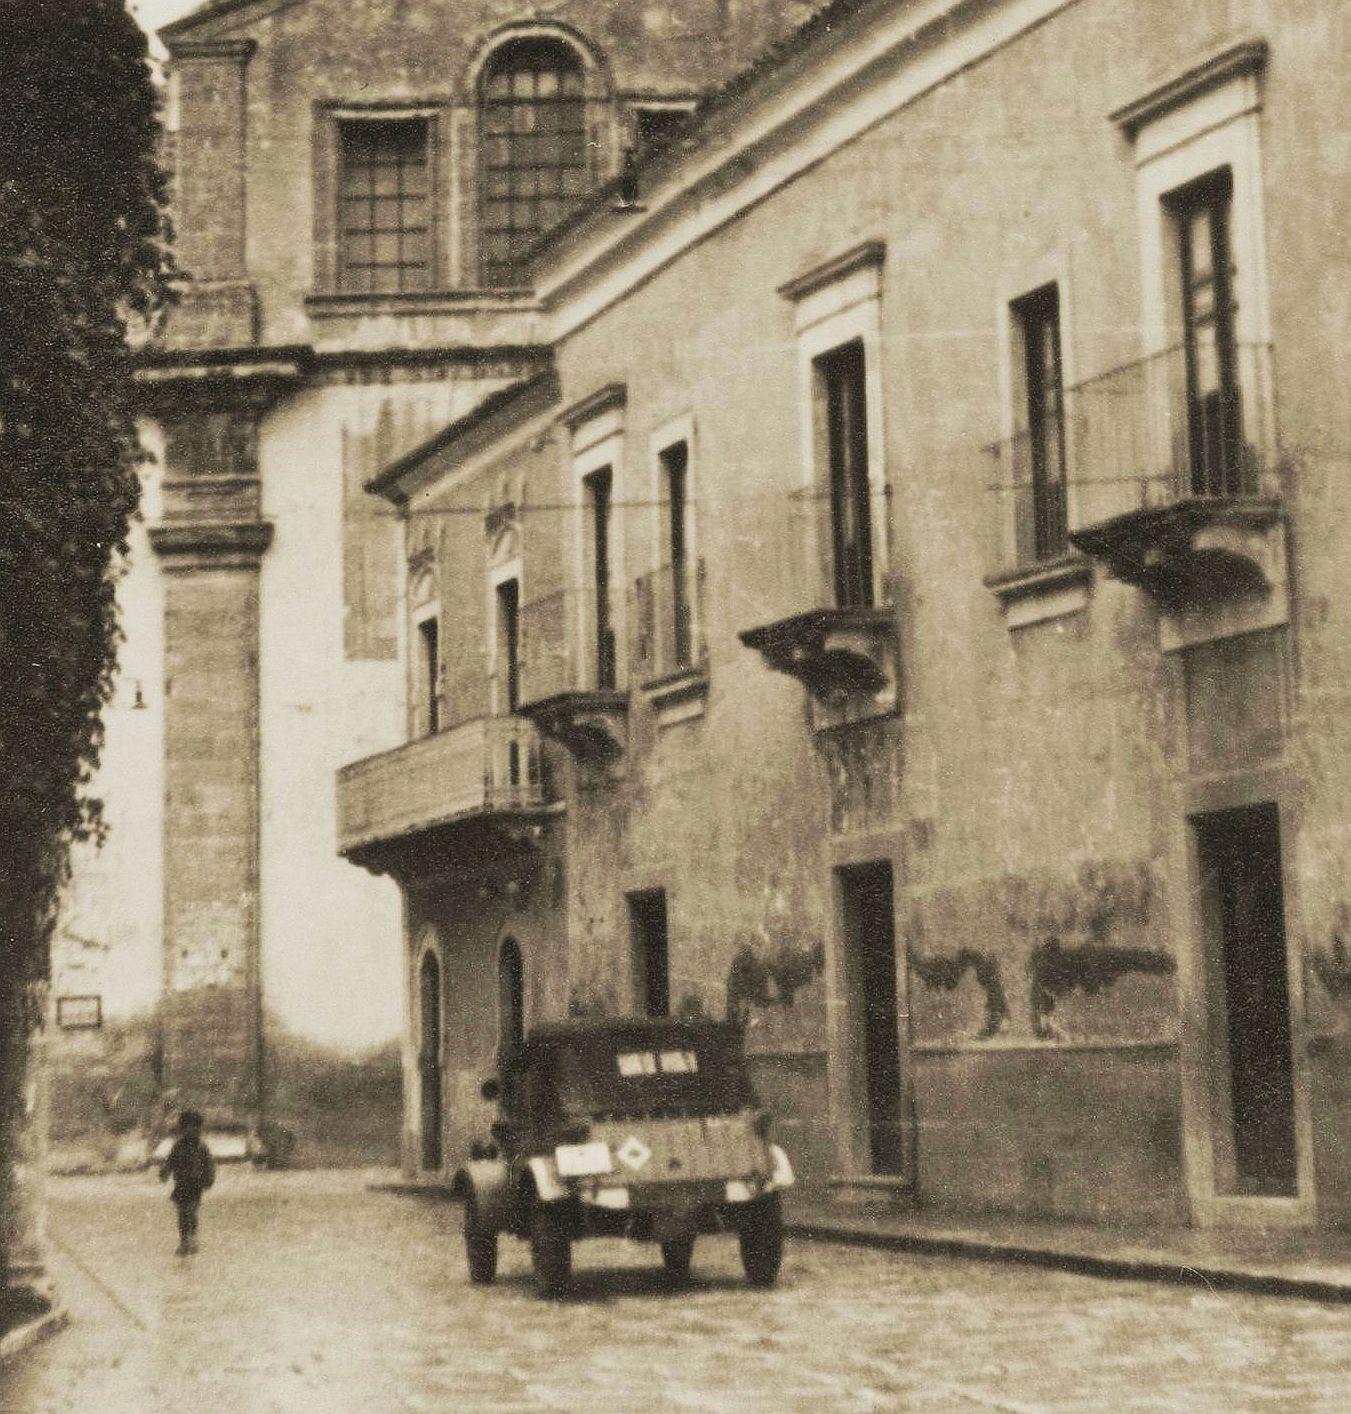 vw_kubelwagen_comiso_sizilien_03-1942_ausschnitt